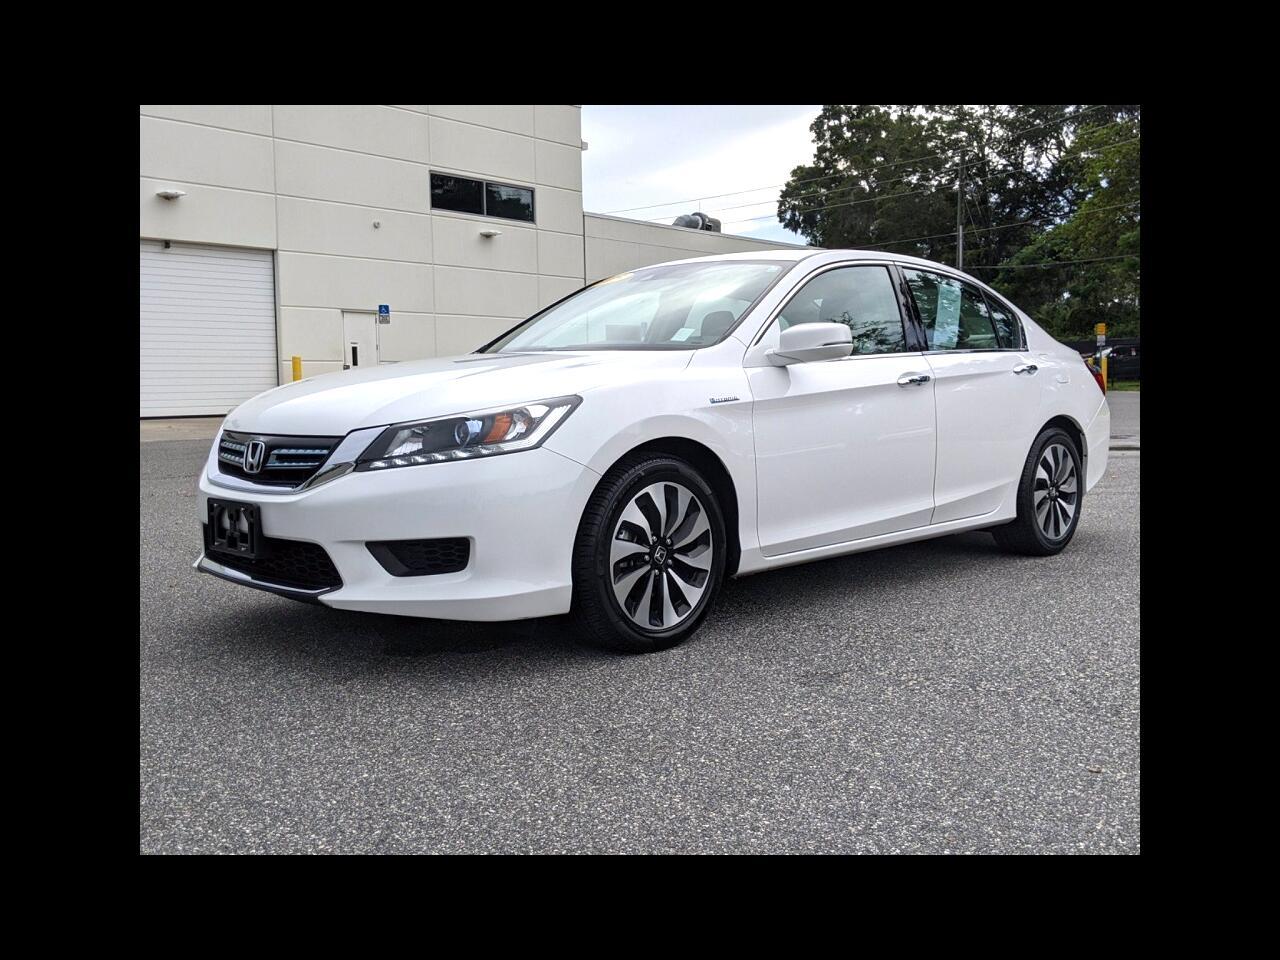 Honda Accord Hybrid 4dr Sdn EX-L 2015